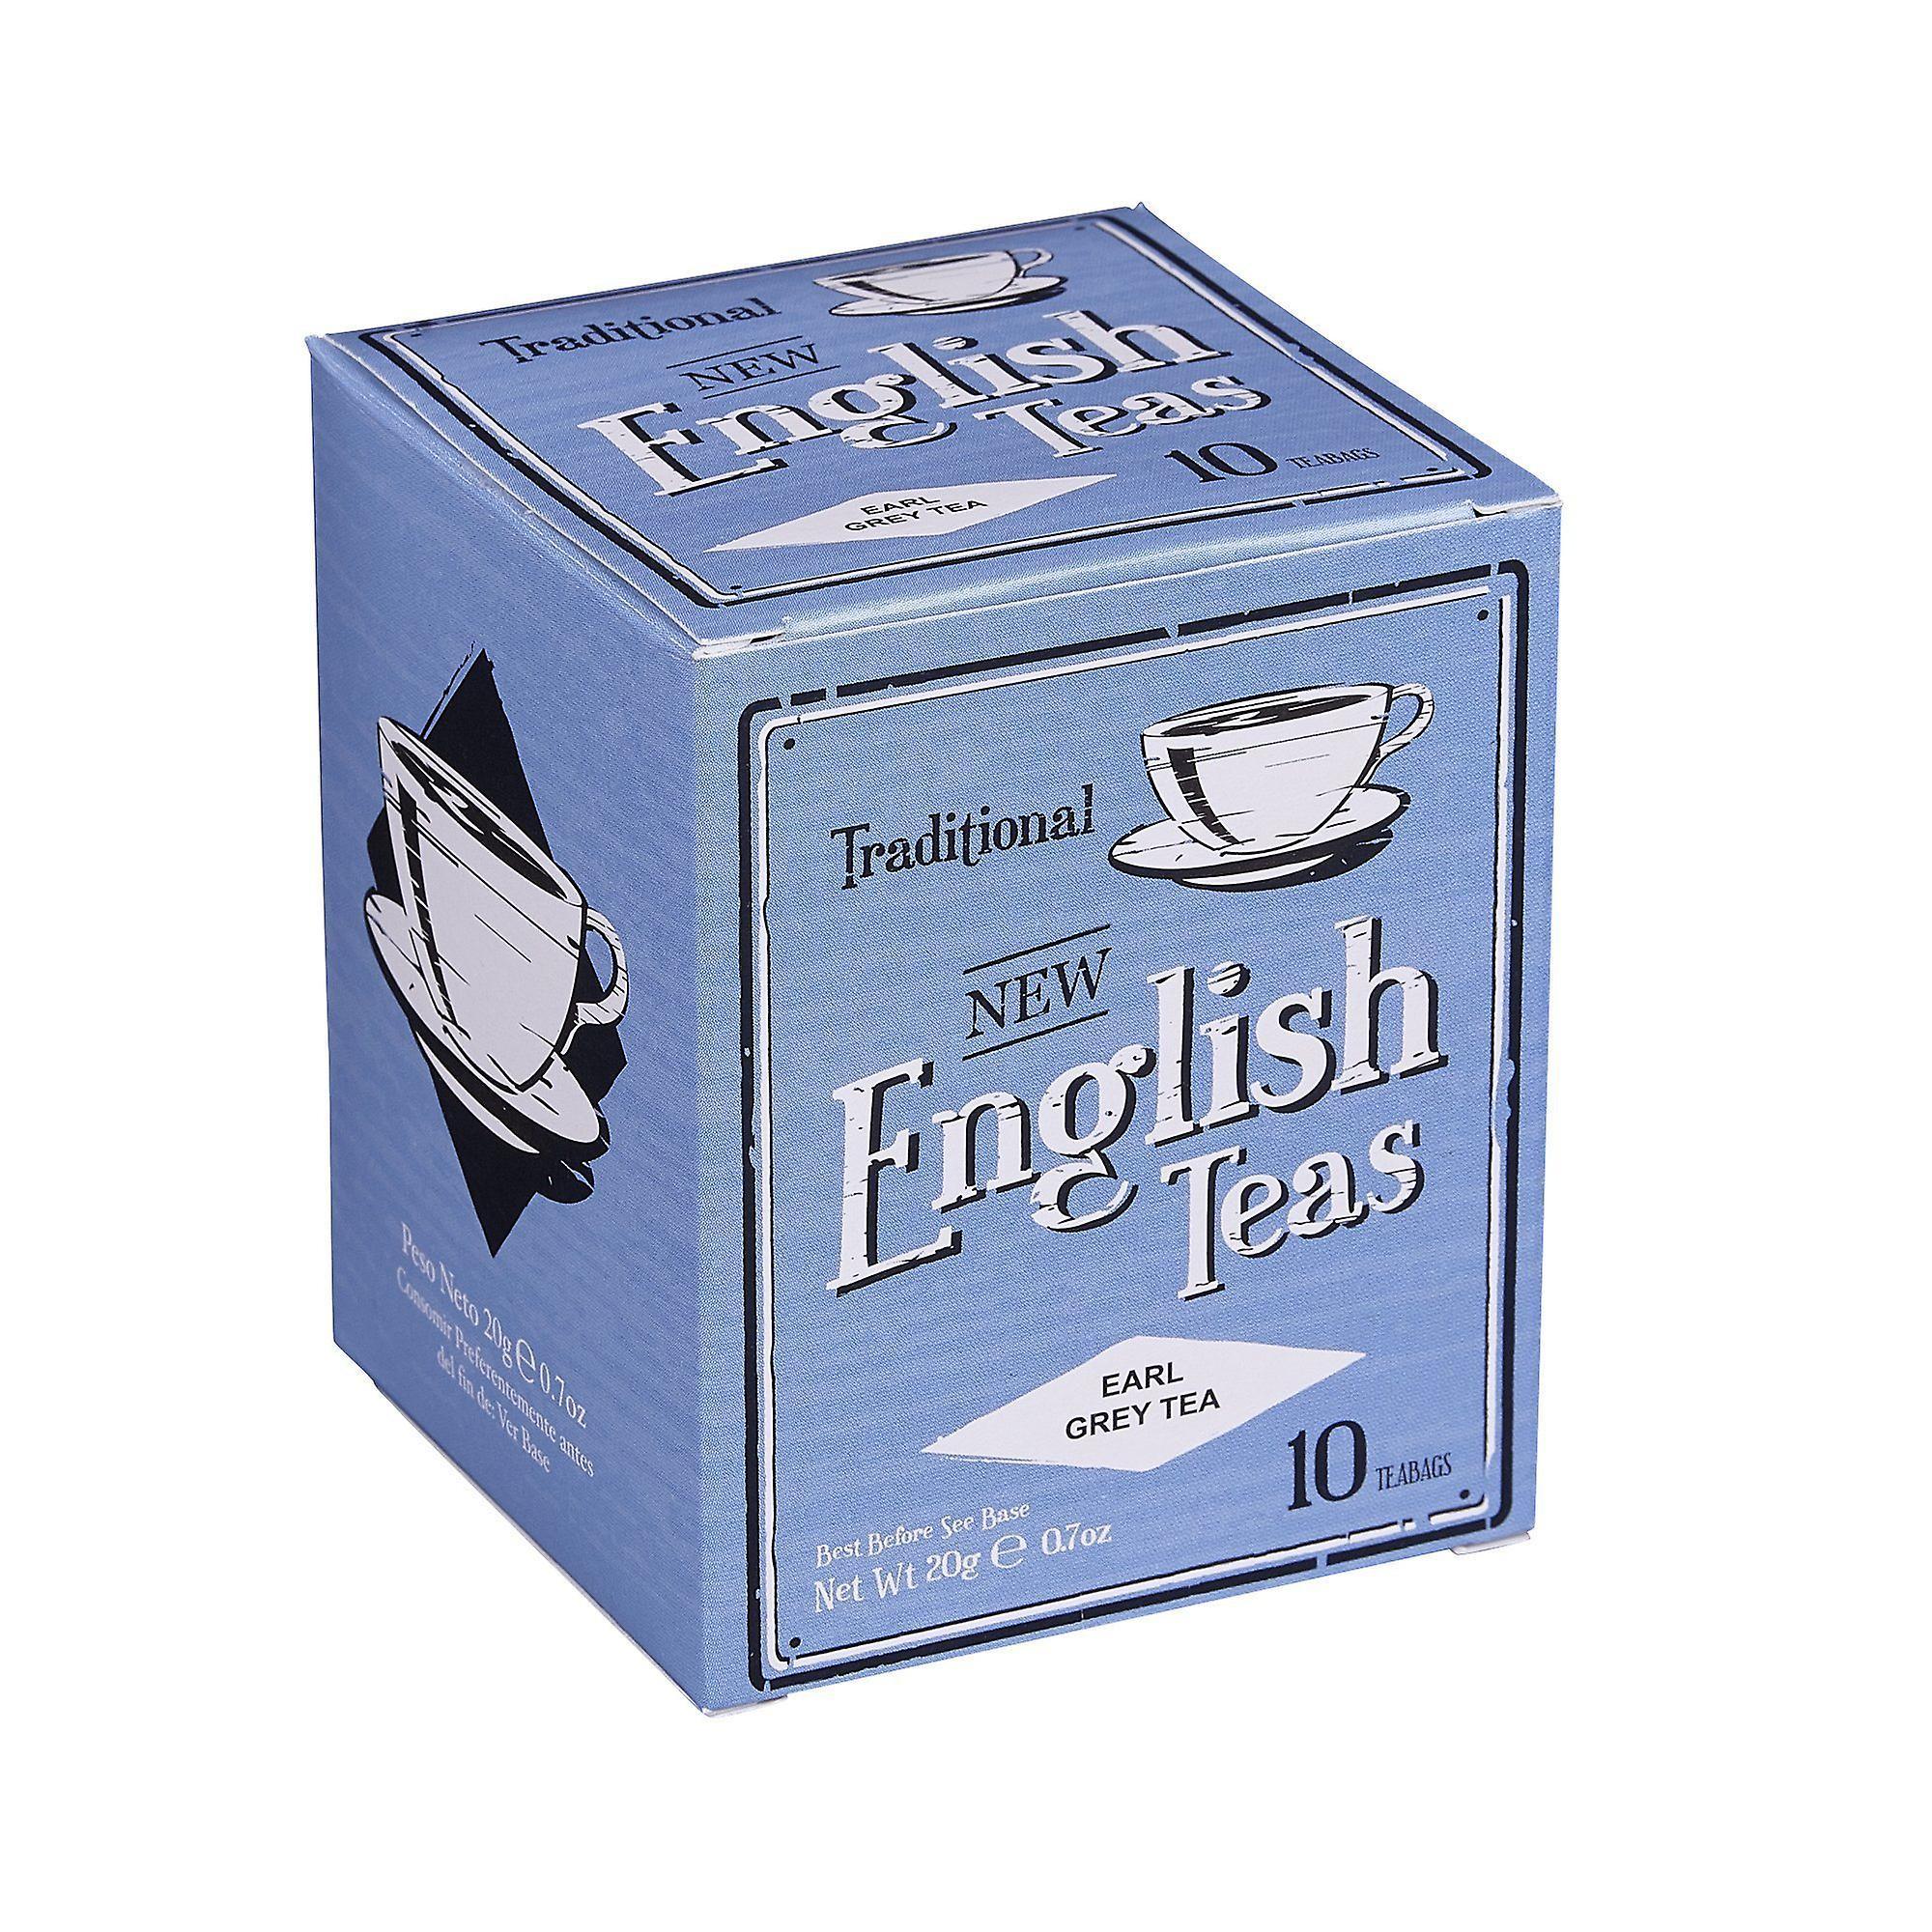 Vintage earl grey tea 10 teabag carton